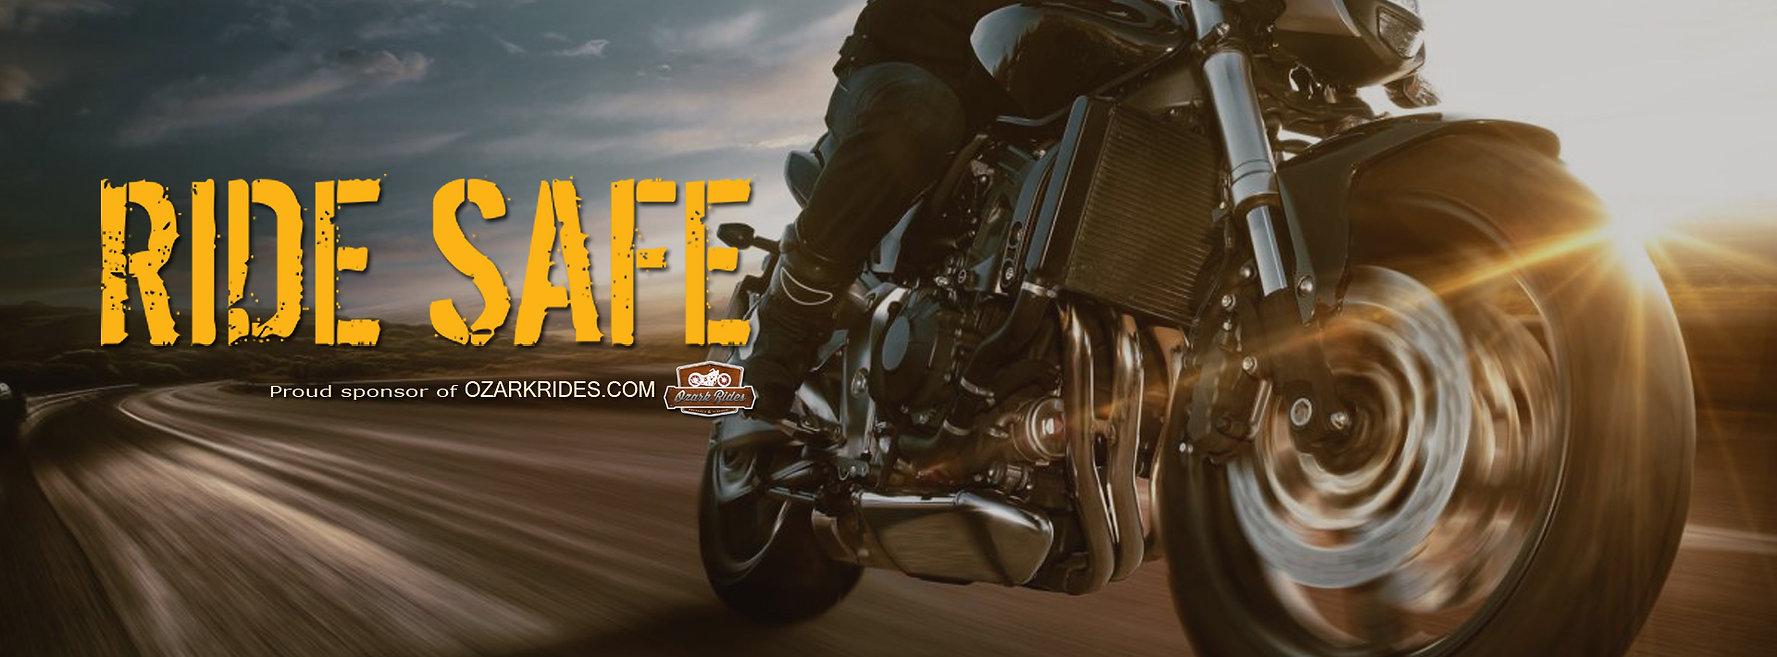 MotorcyclePageBannerFull.jpg